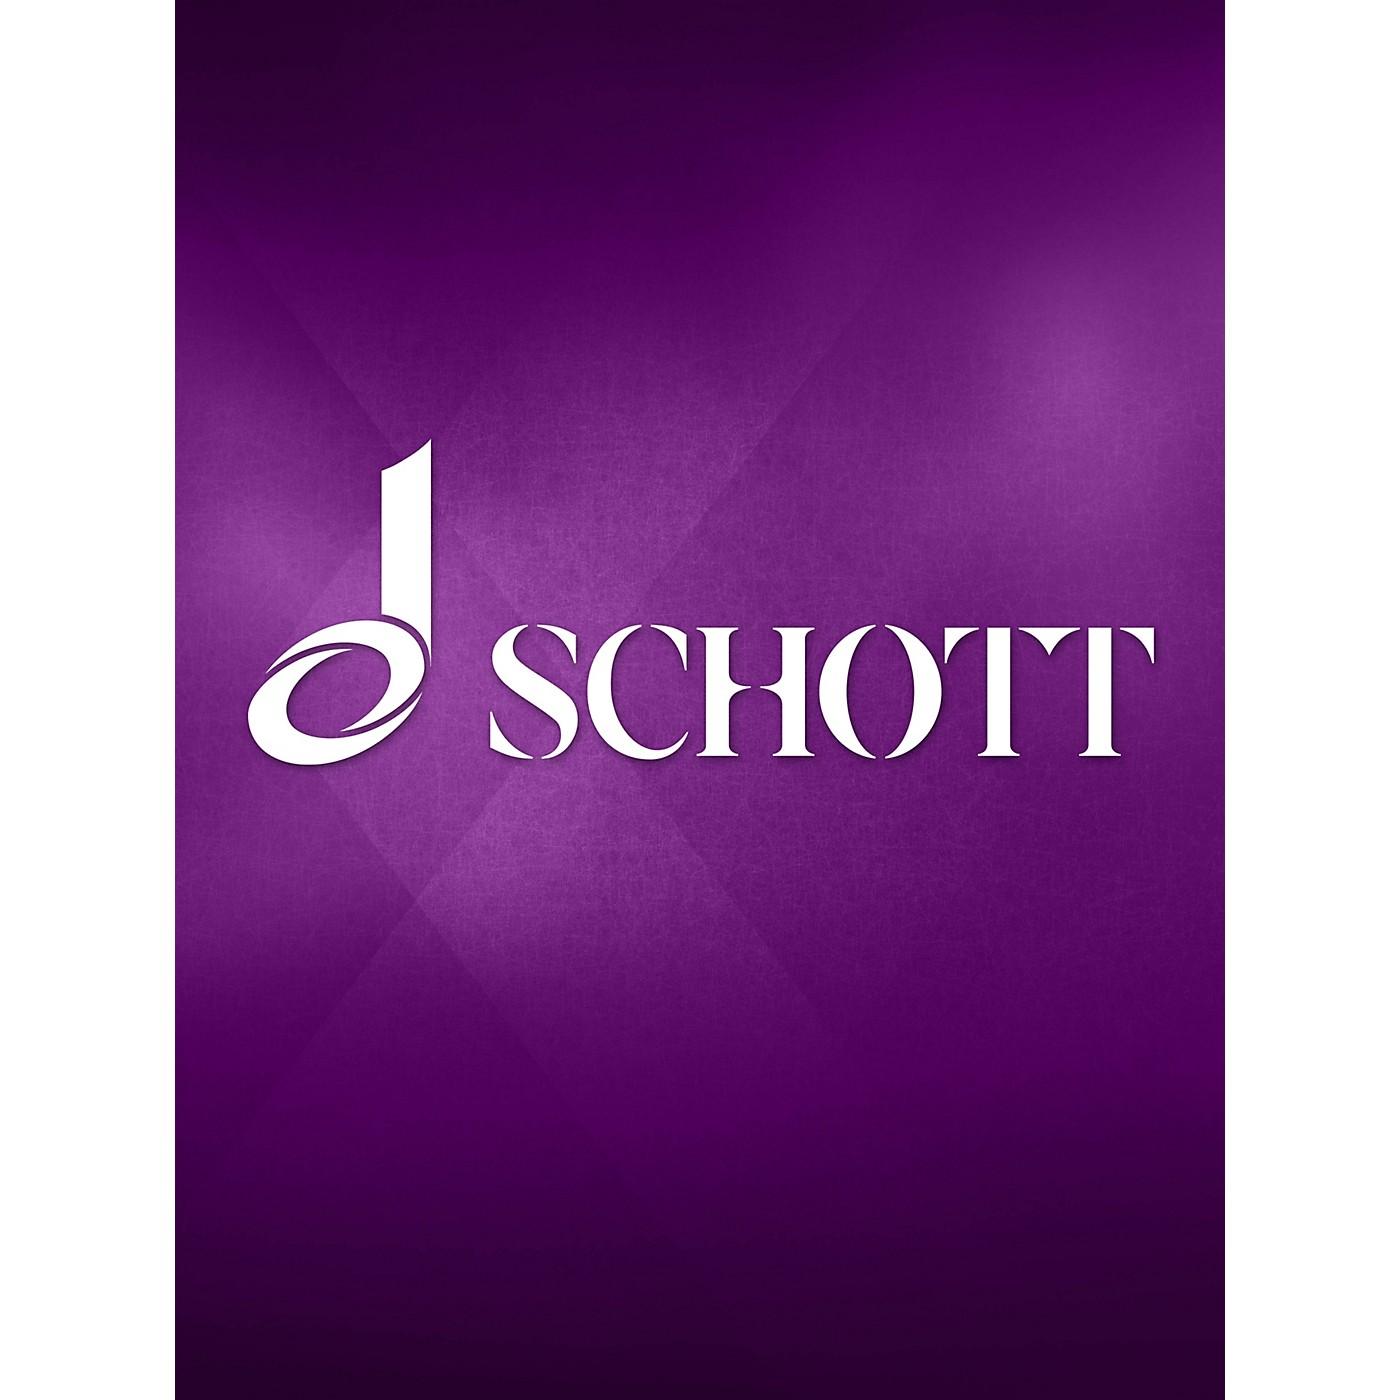 Schott Bmmg Vol. 32 (German Language) Schott Series thumbnail